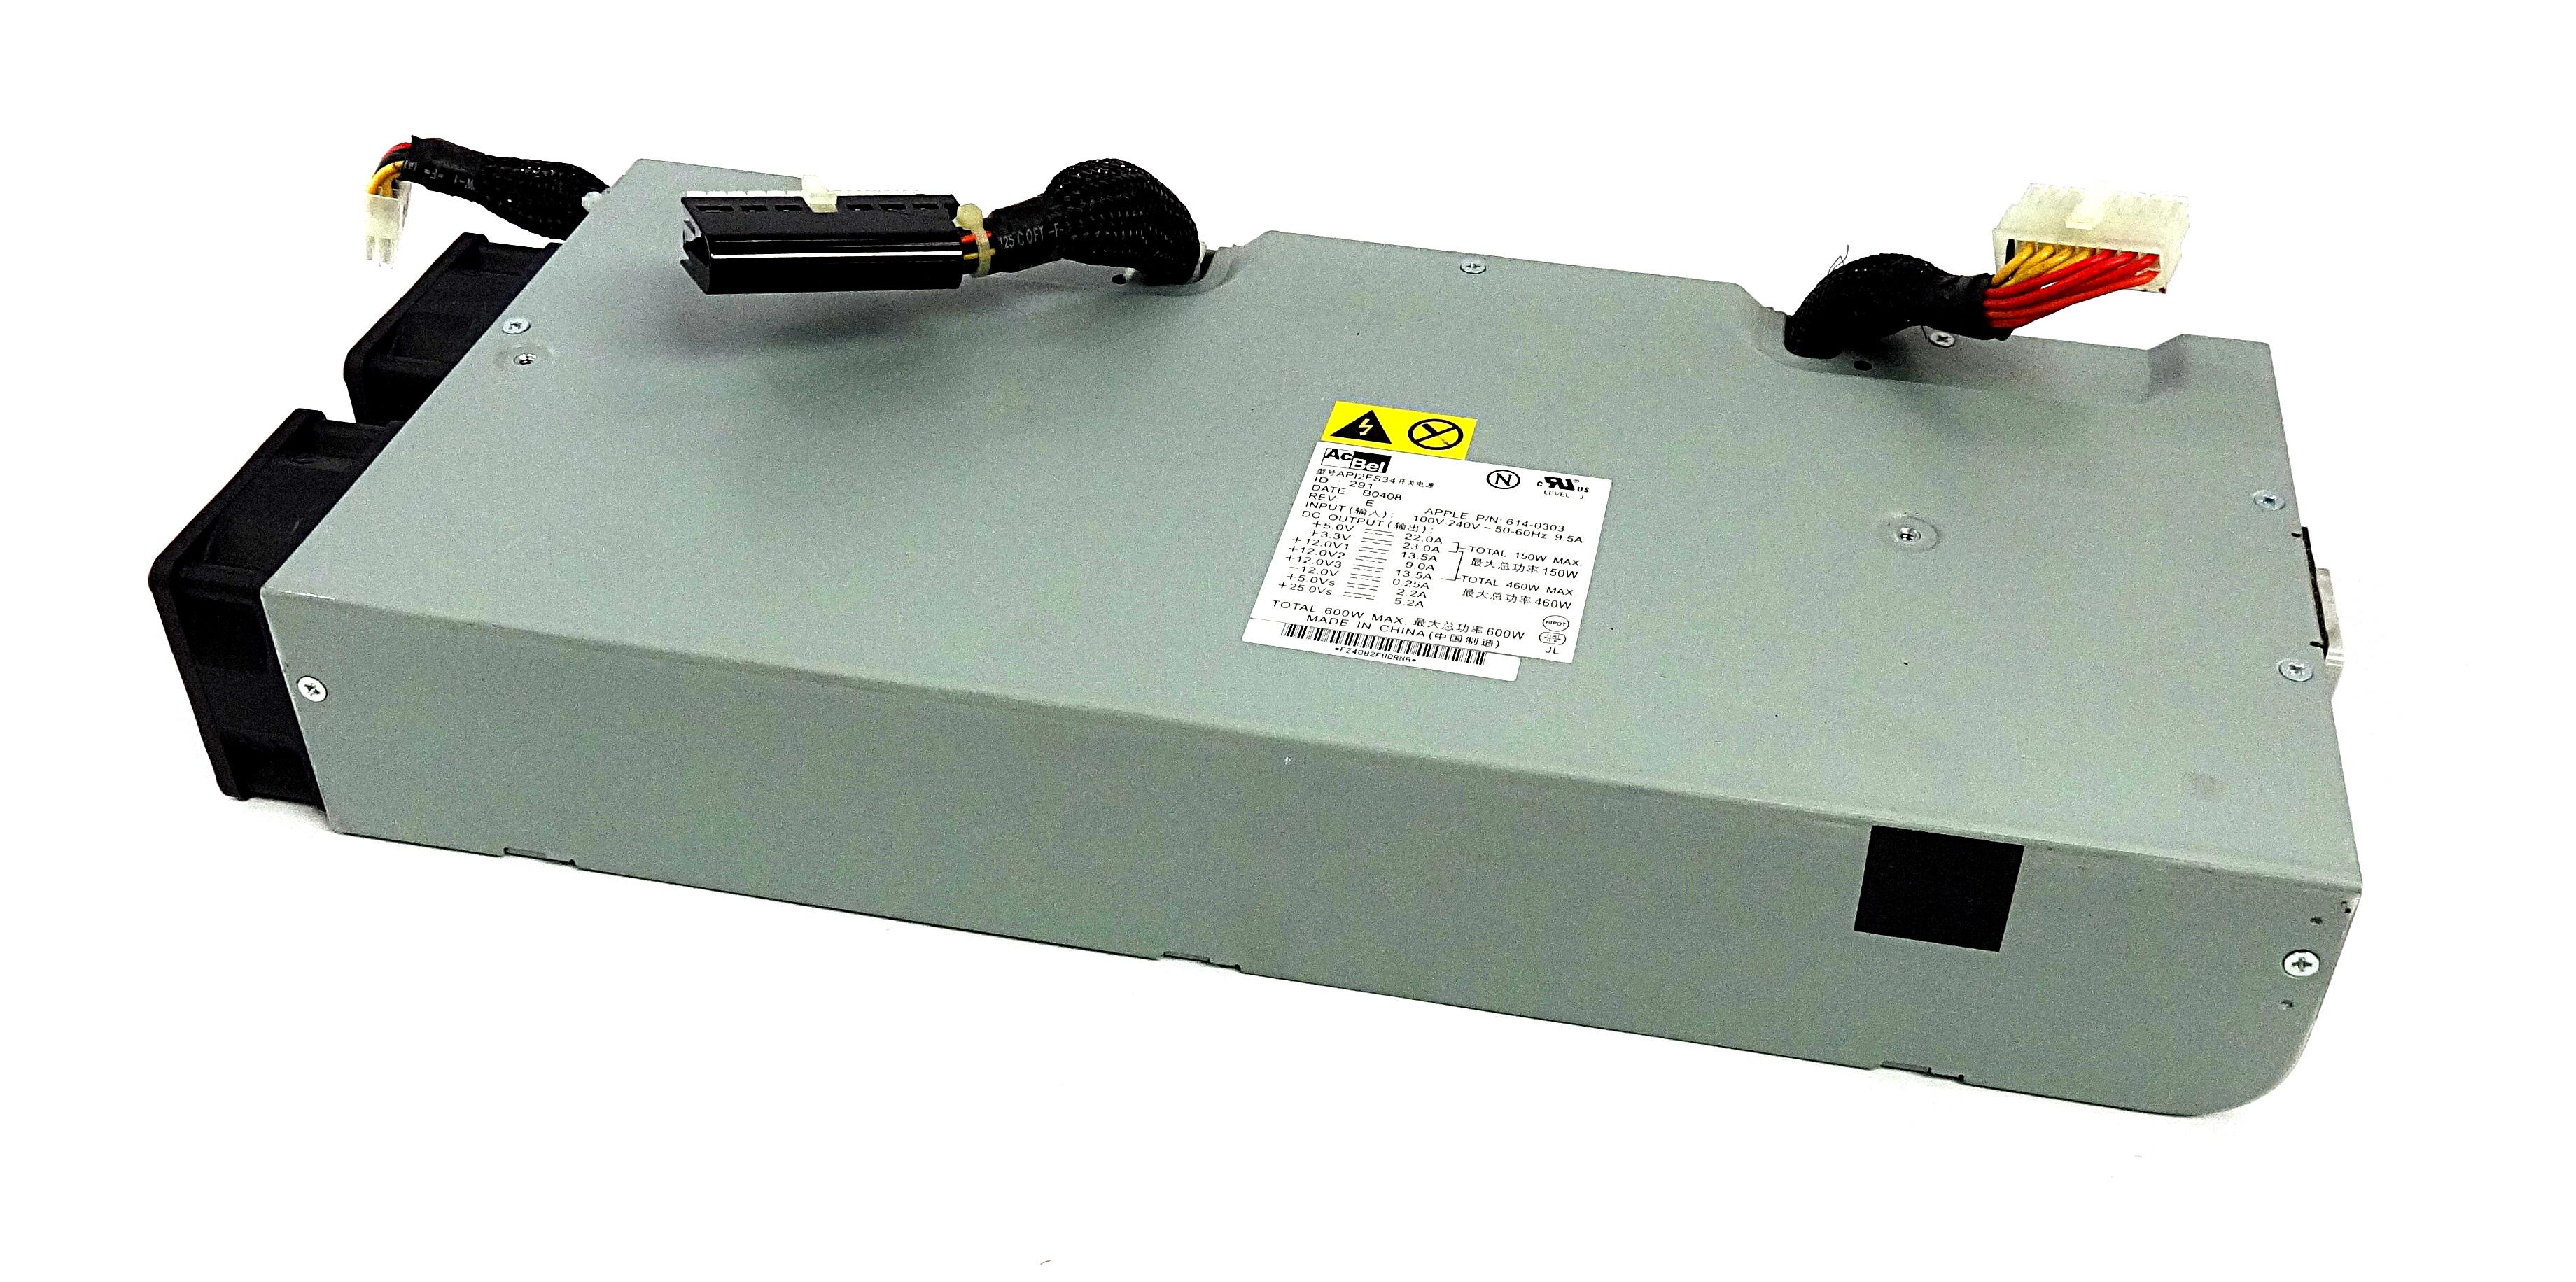 Apple 614-0303 Power Mac G5 600W Max. Power Supply- AcBel Model: API2FS34